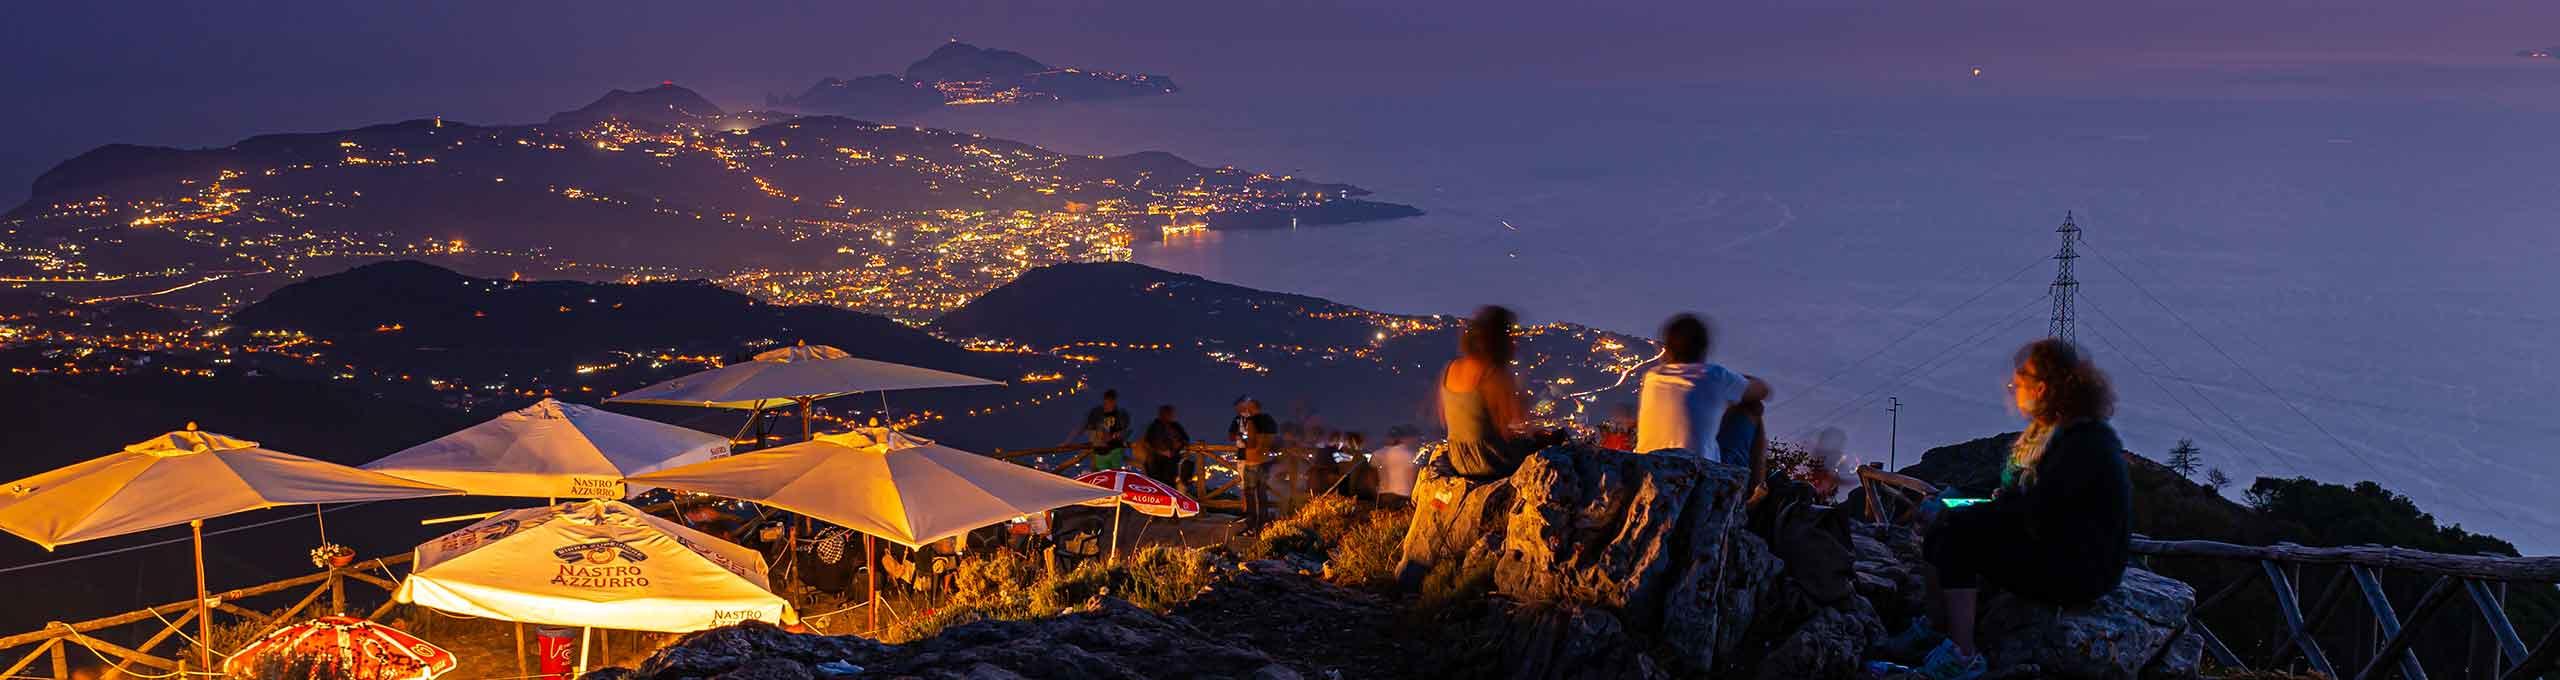 Pimonte, Costiera Amalfitana